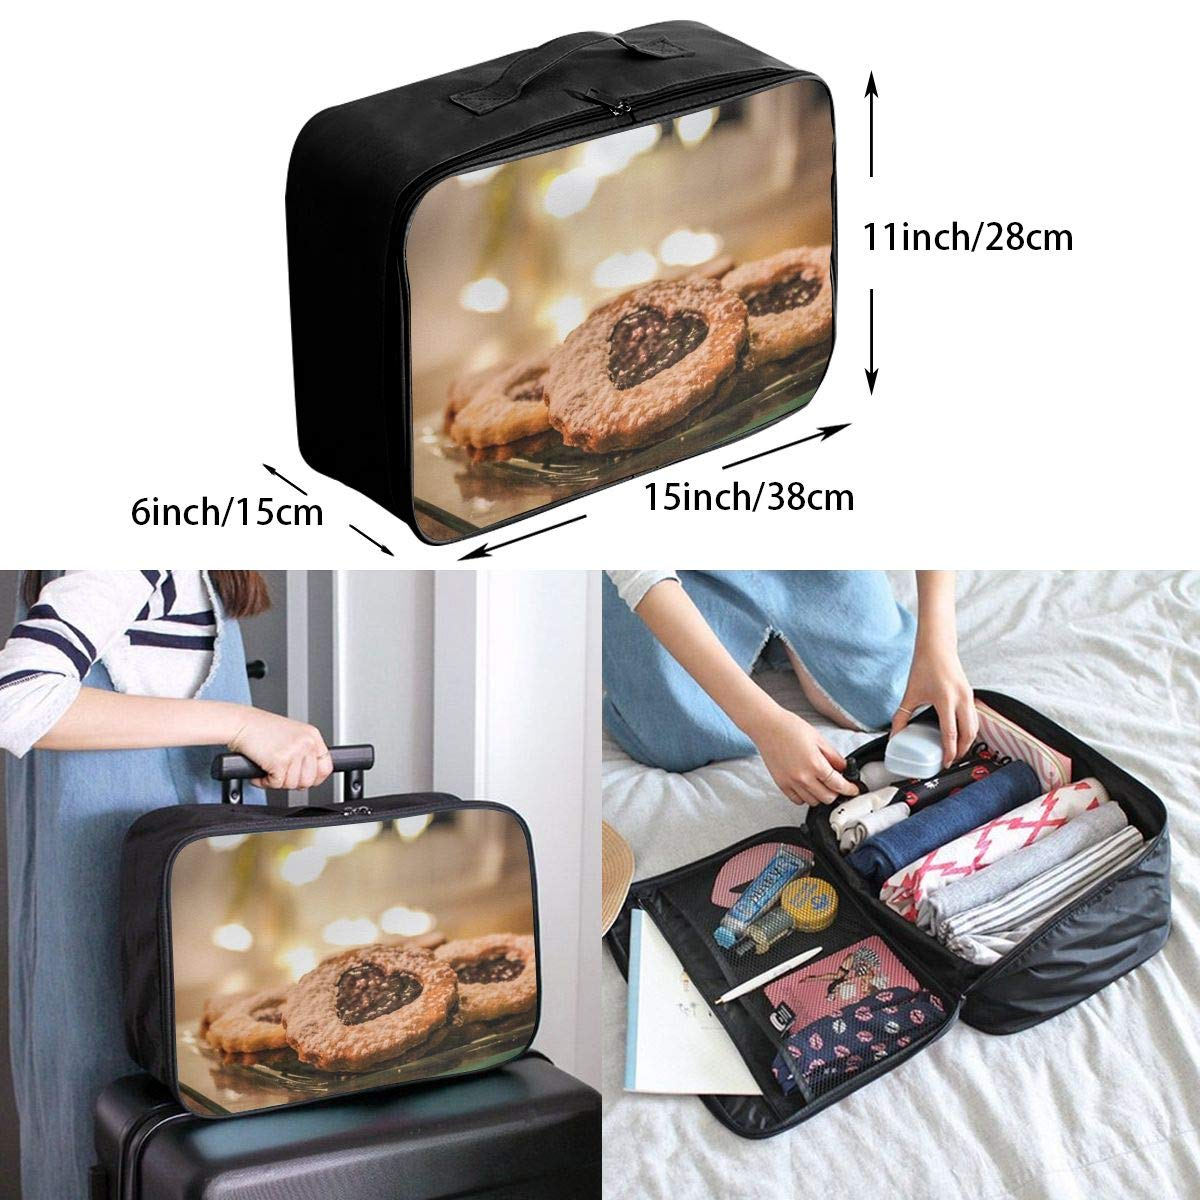 Travel Luggage Duffle Bag Lightweight Portable Handbag Biscuits Cookie Large Capacity Waterproof Foldable Storage Tote